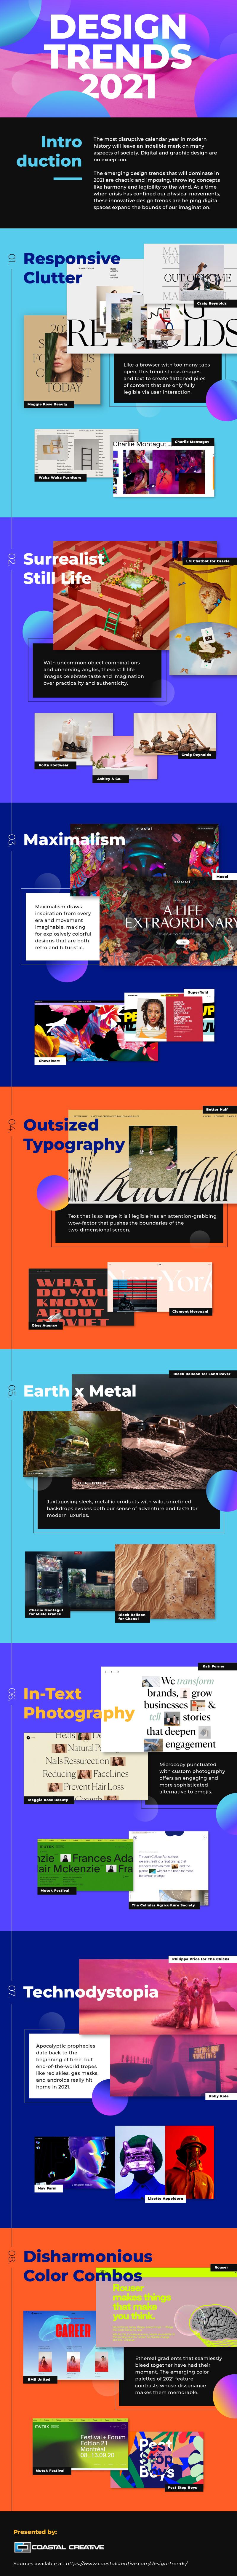 Design trends infographic